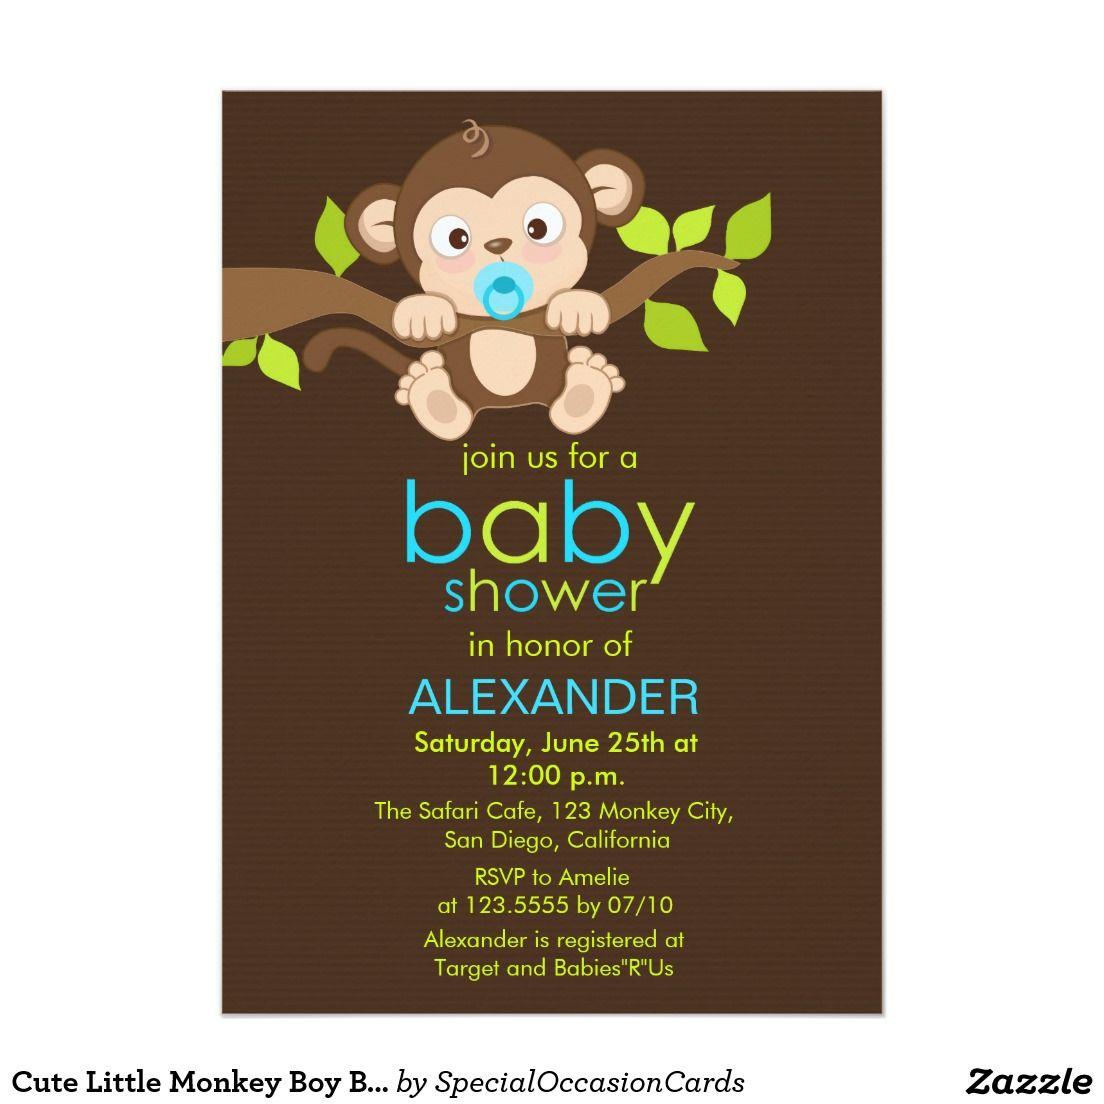 Cute Little Monkey Boy Baby Shower Invitation | Boy baby showers ...